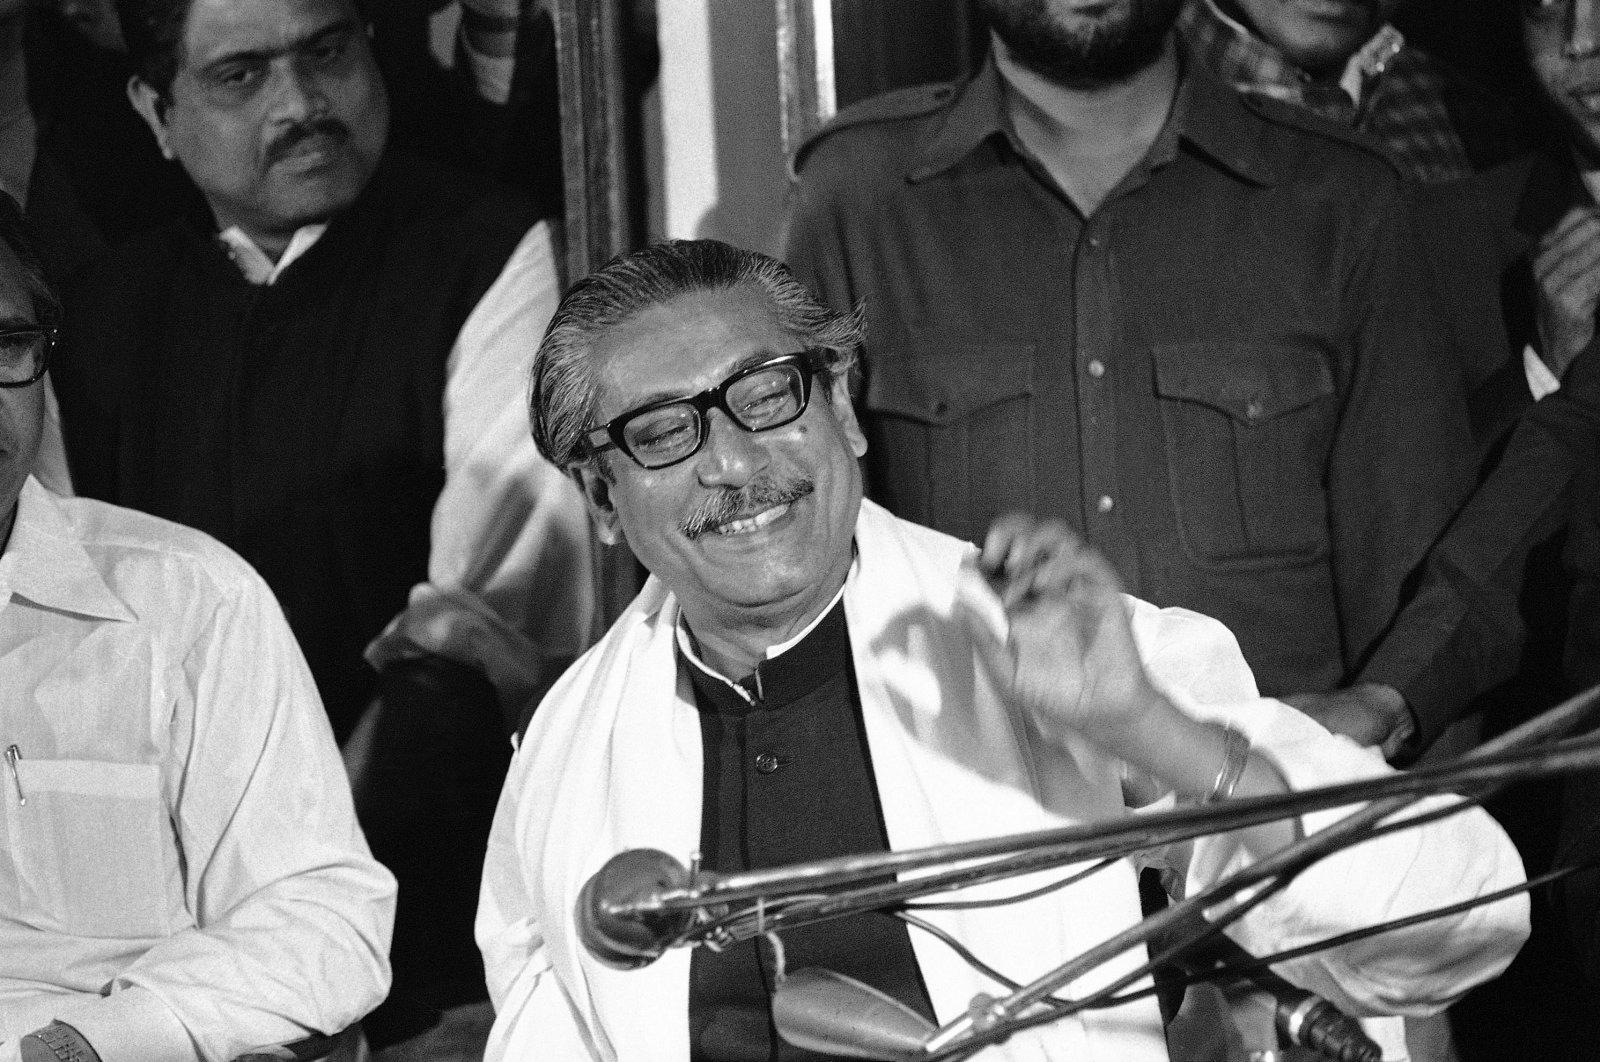 Sheikh Mujibur Rahman speaks at press conference in Dacca, Bangladesh, Jan. 14, 1972. (AP Photo)